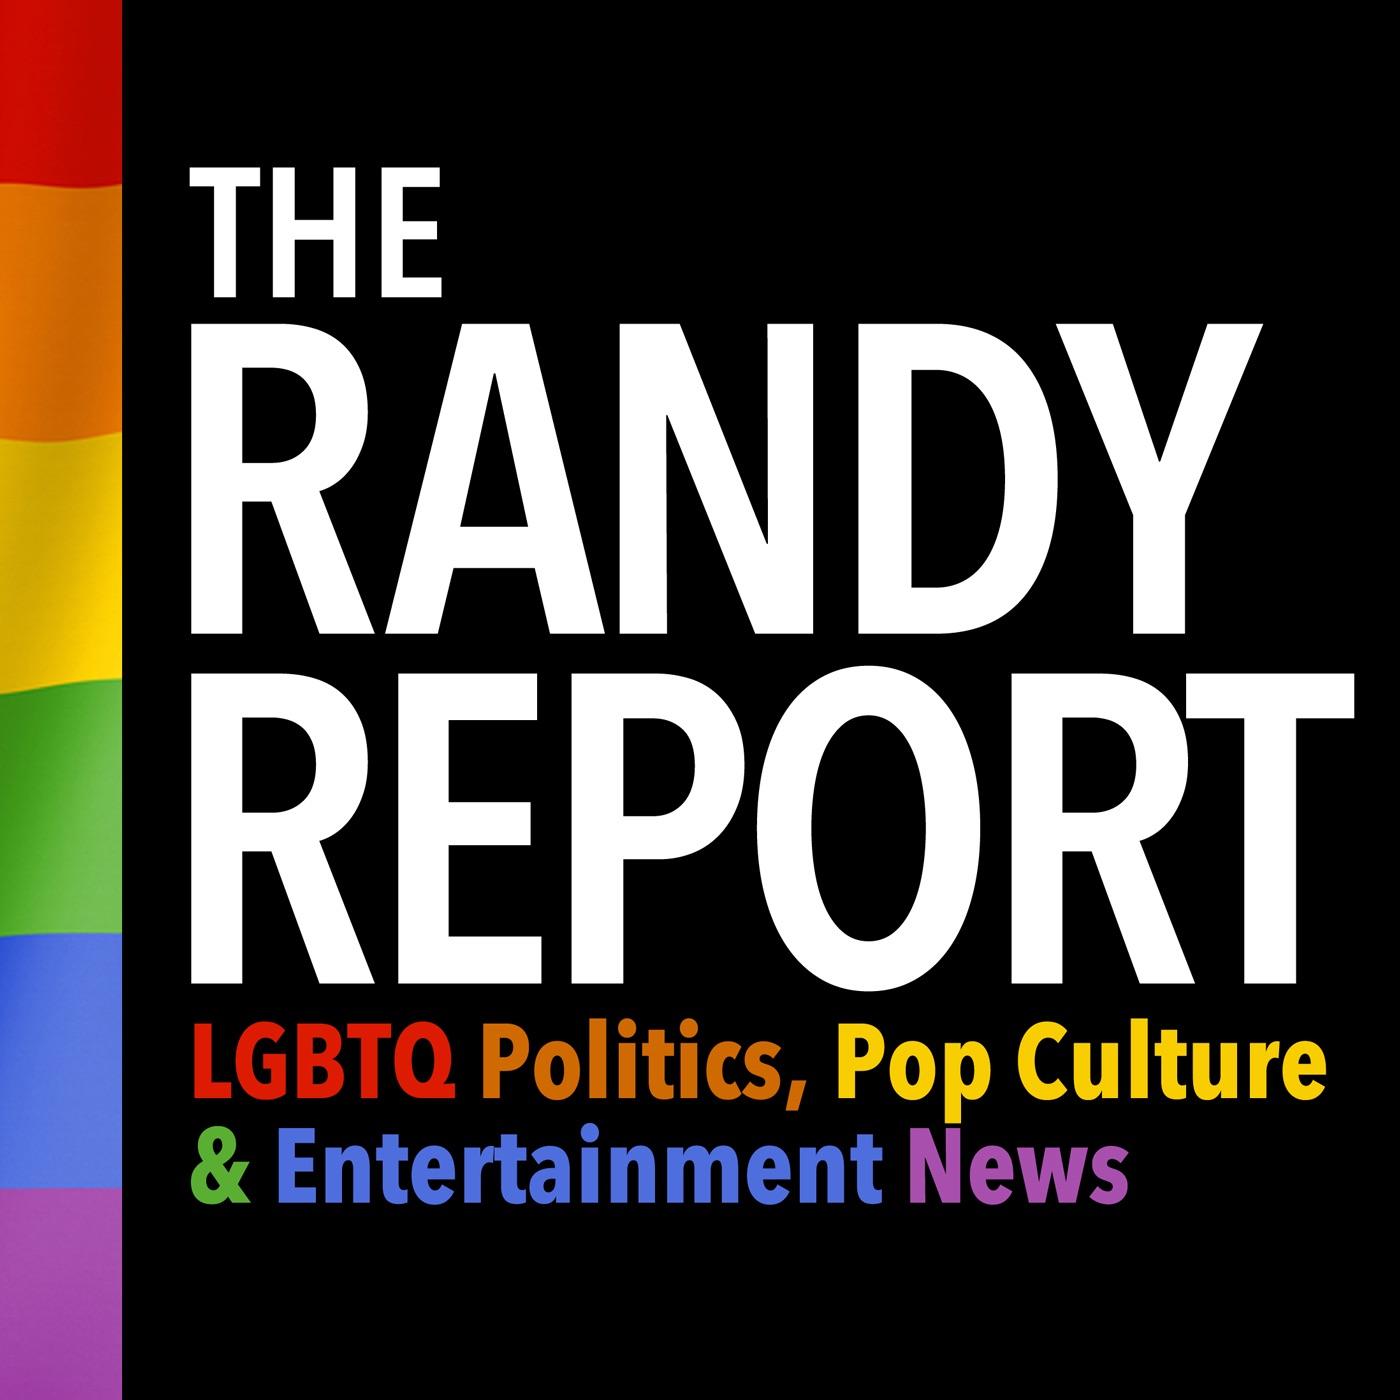 The Randy Report - LGBT Politics & Entertainment